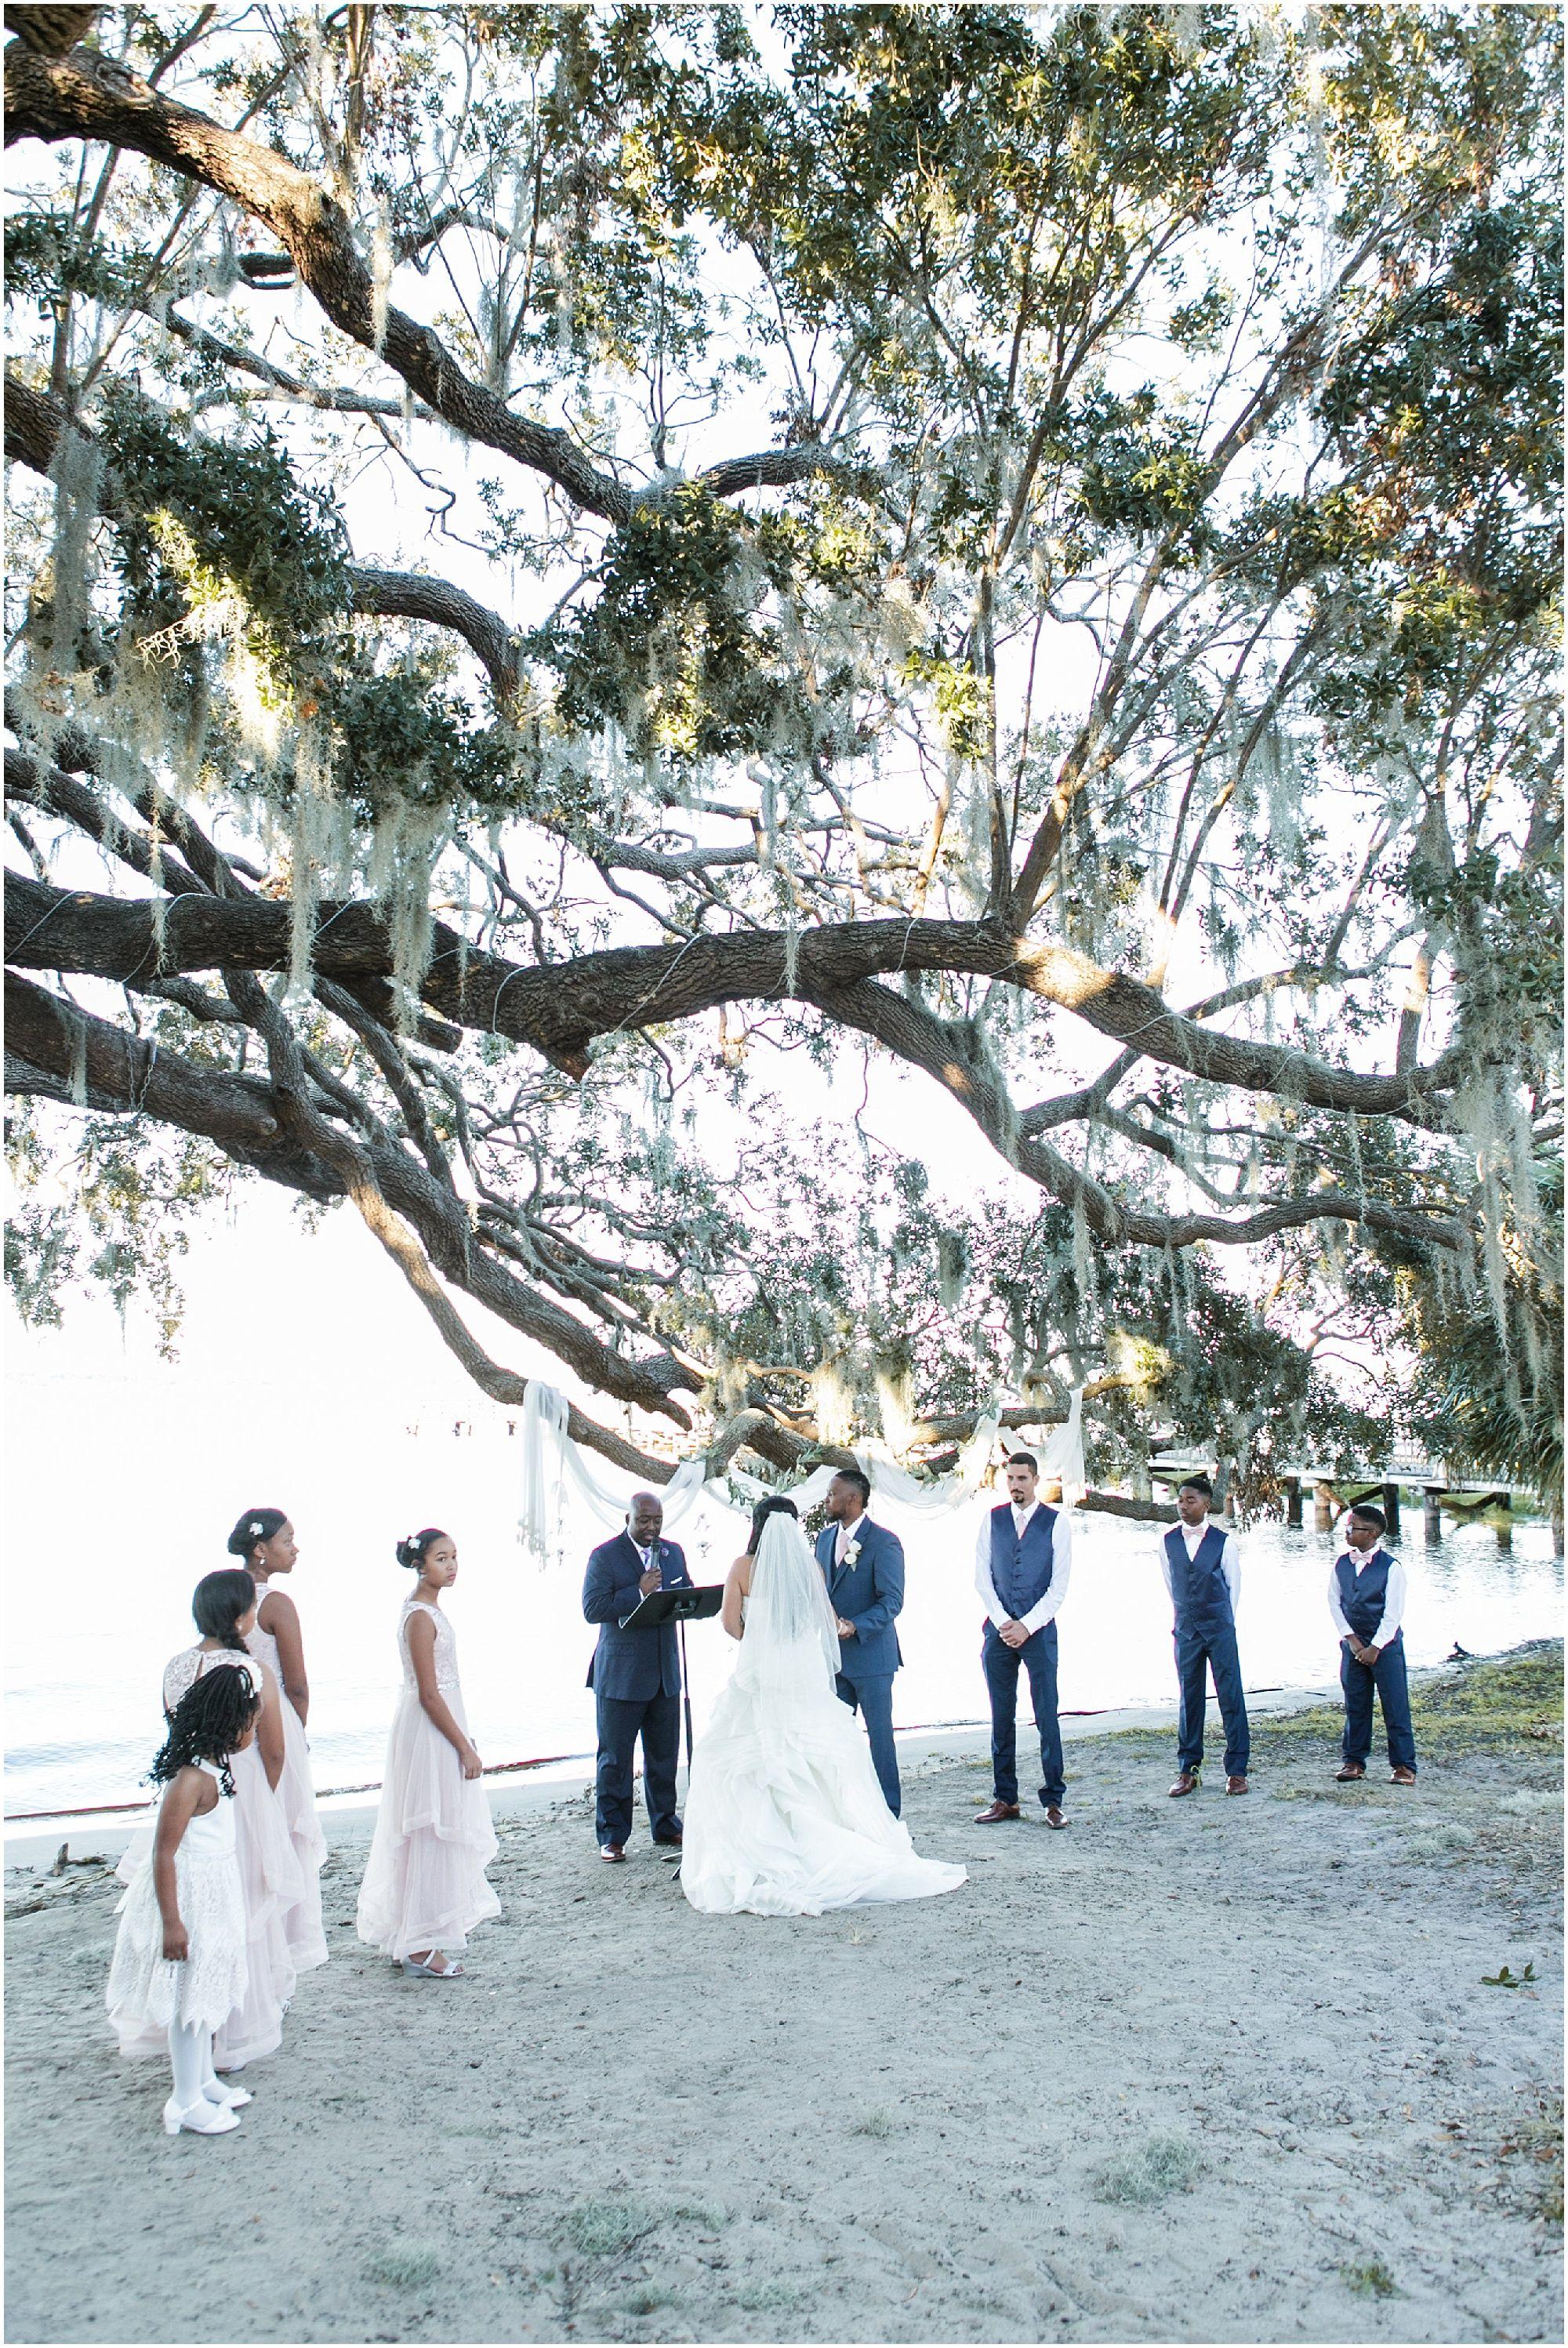 Intimate lakeside wedding clermont florida katreena rod